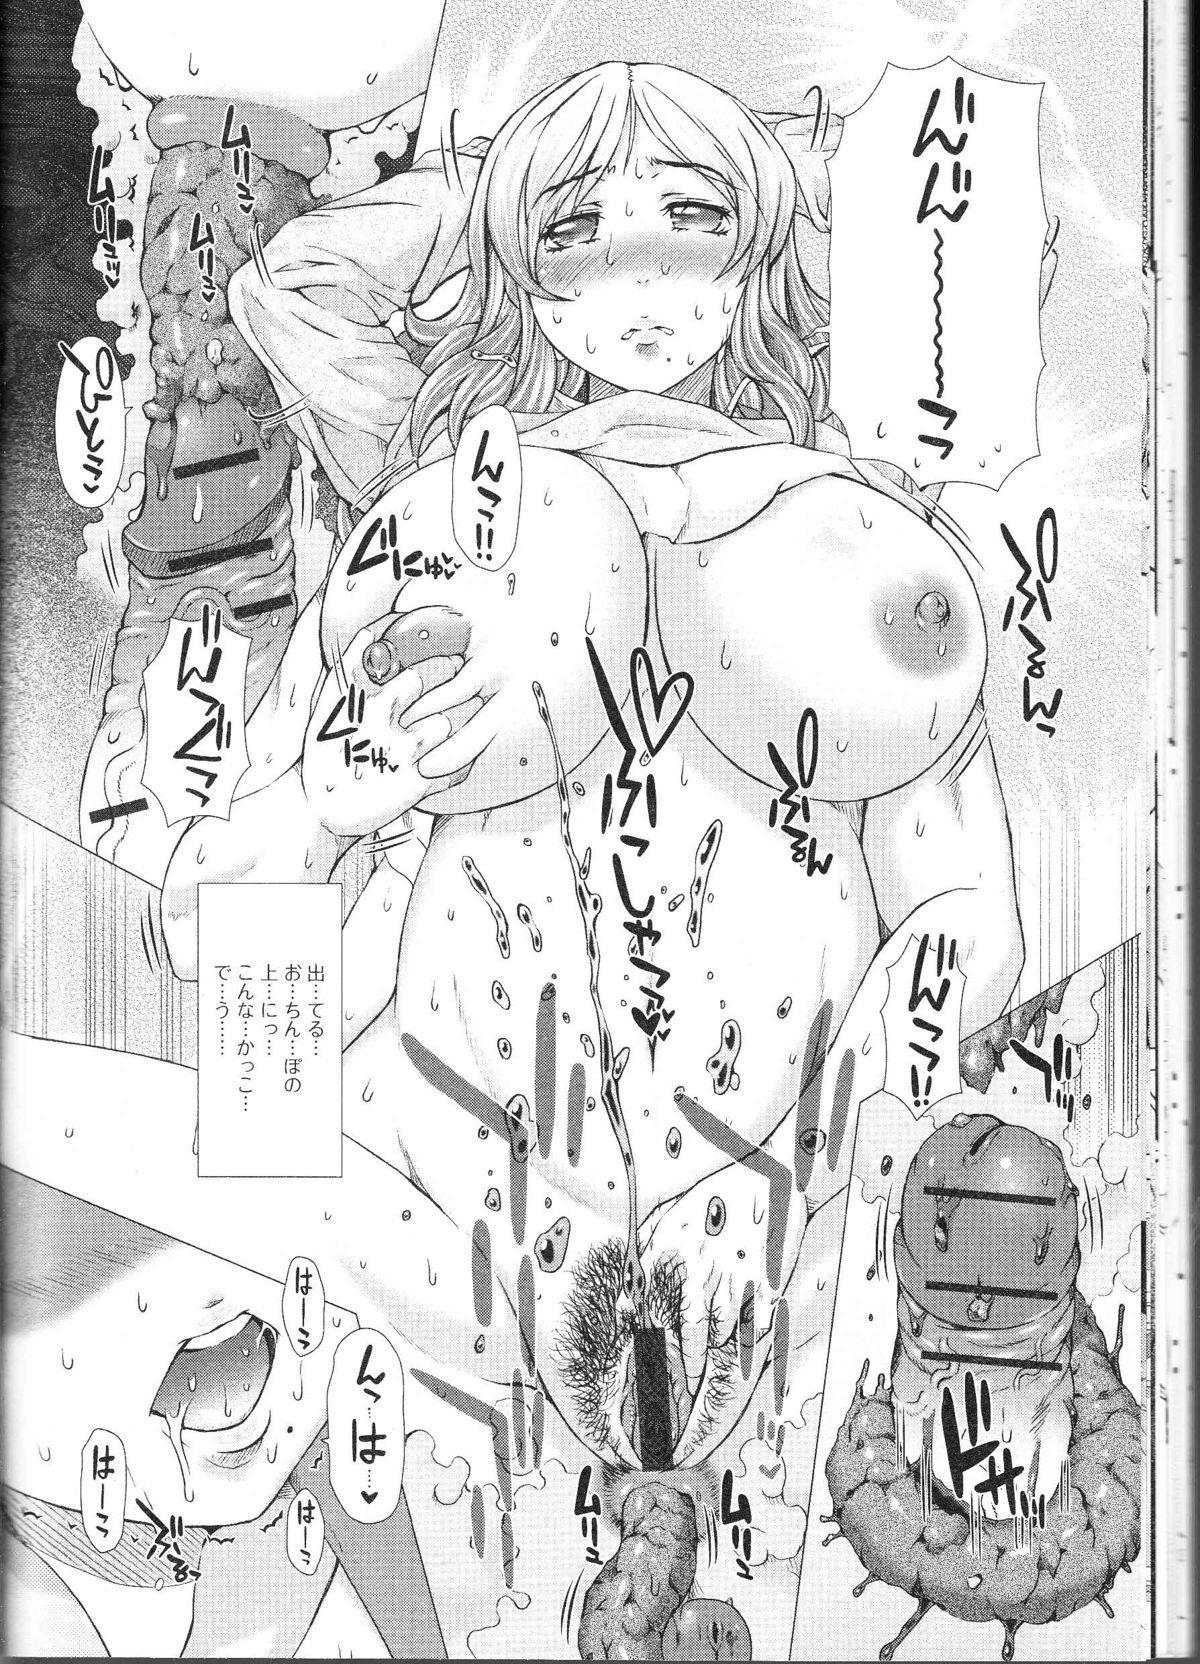 Nozoite wa Ikenai 9 - Do Not Peep! 9 38